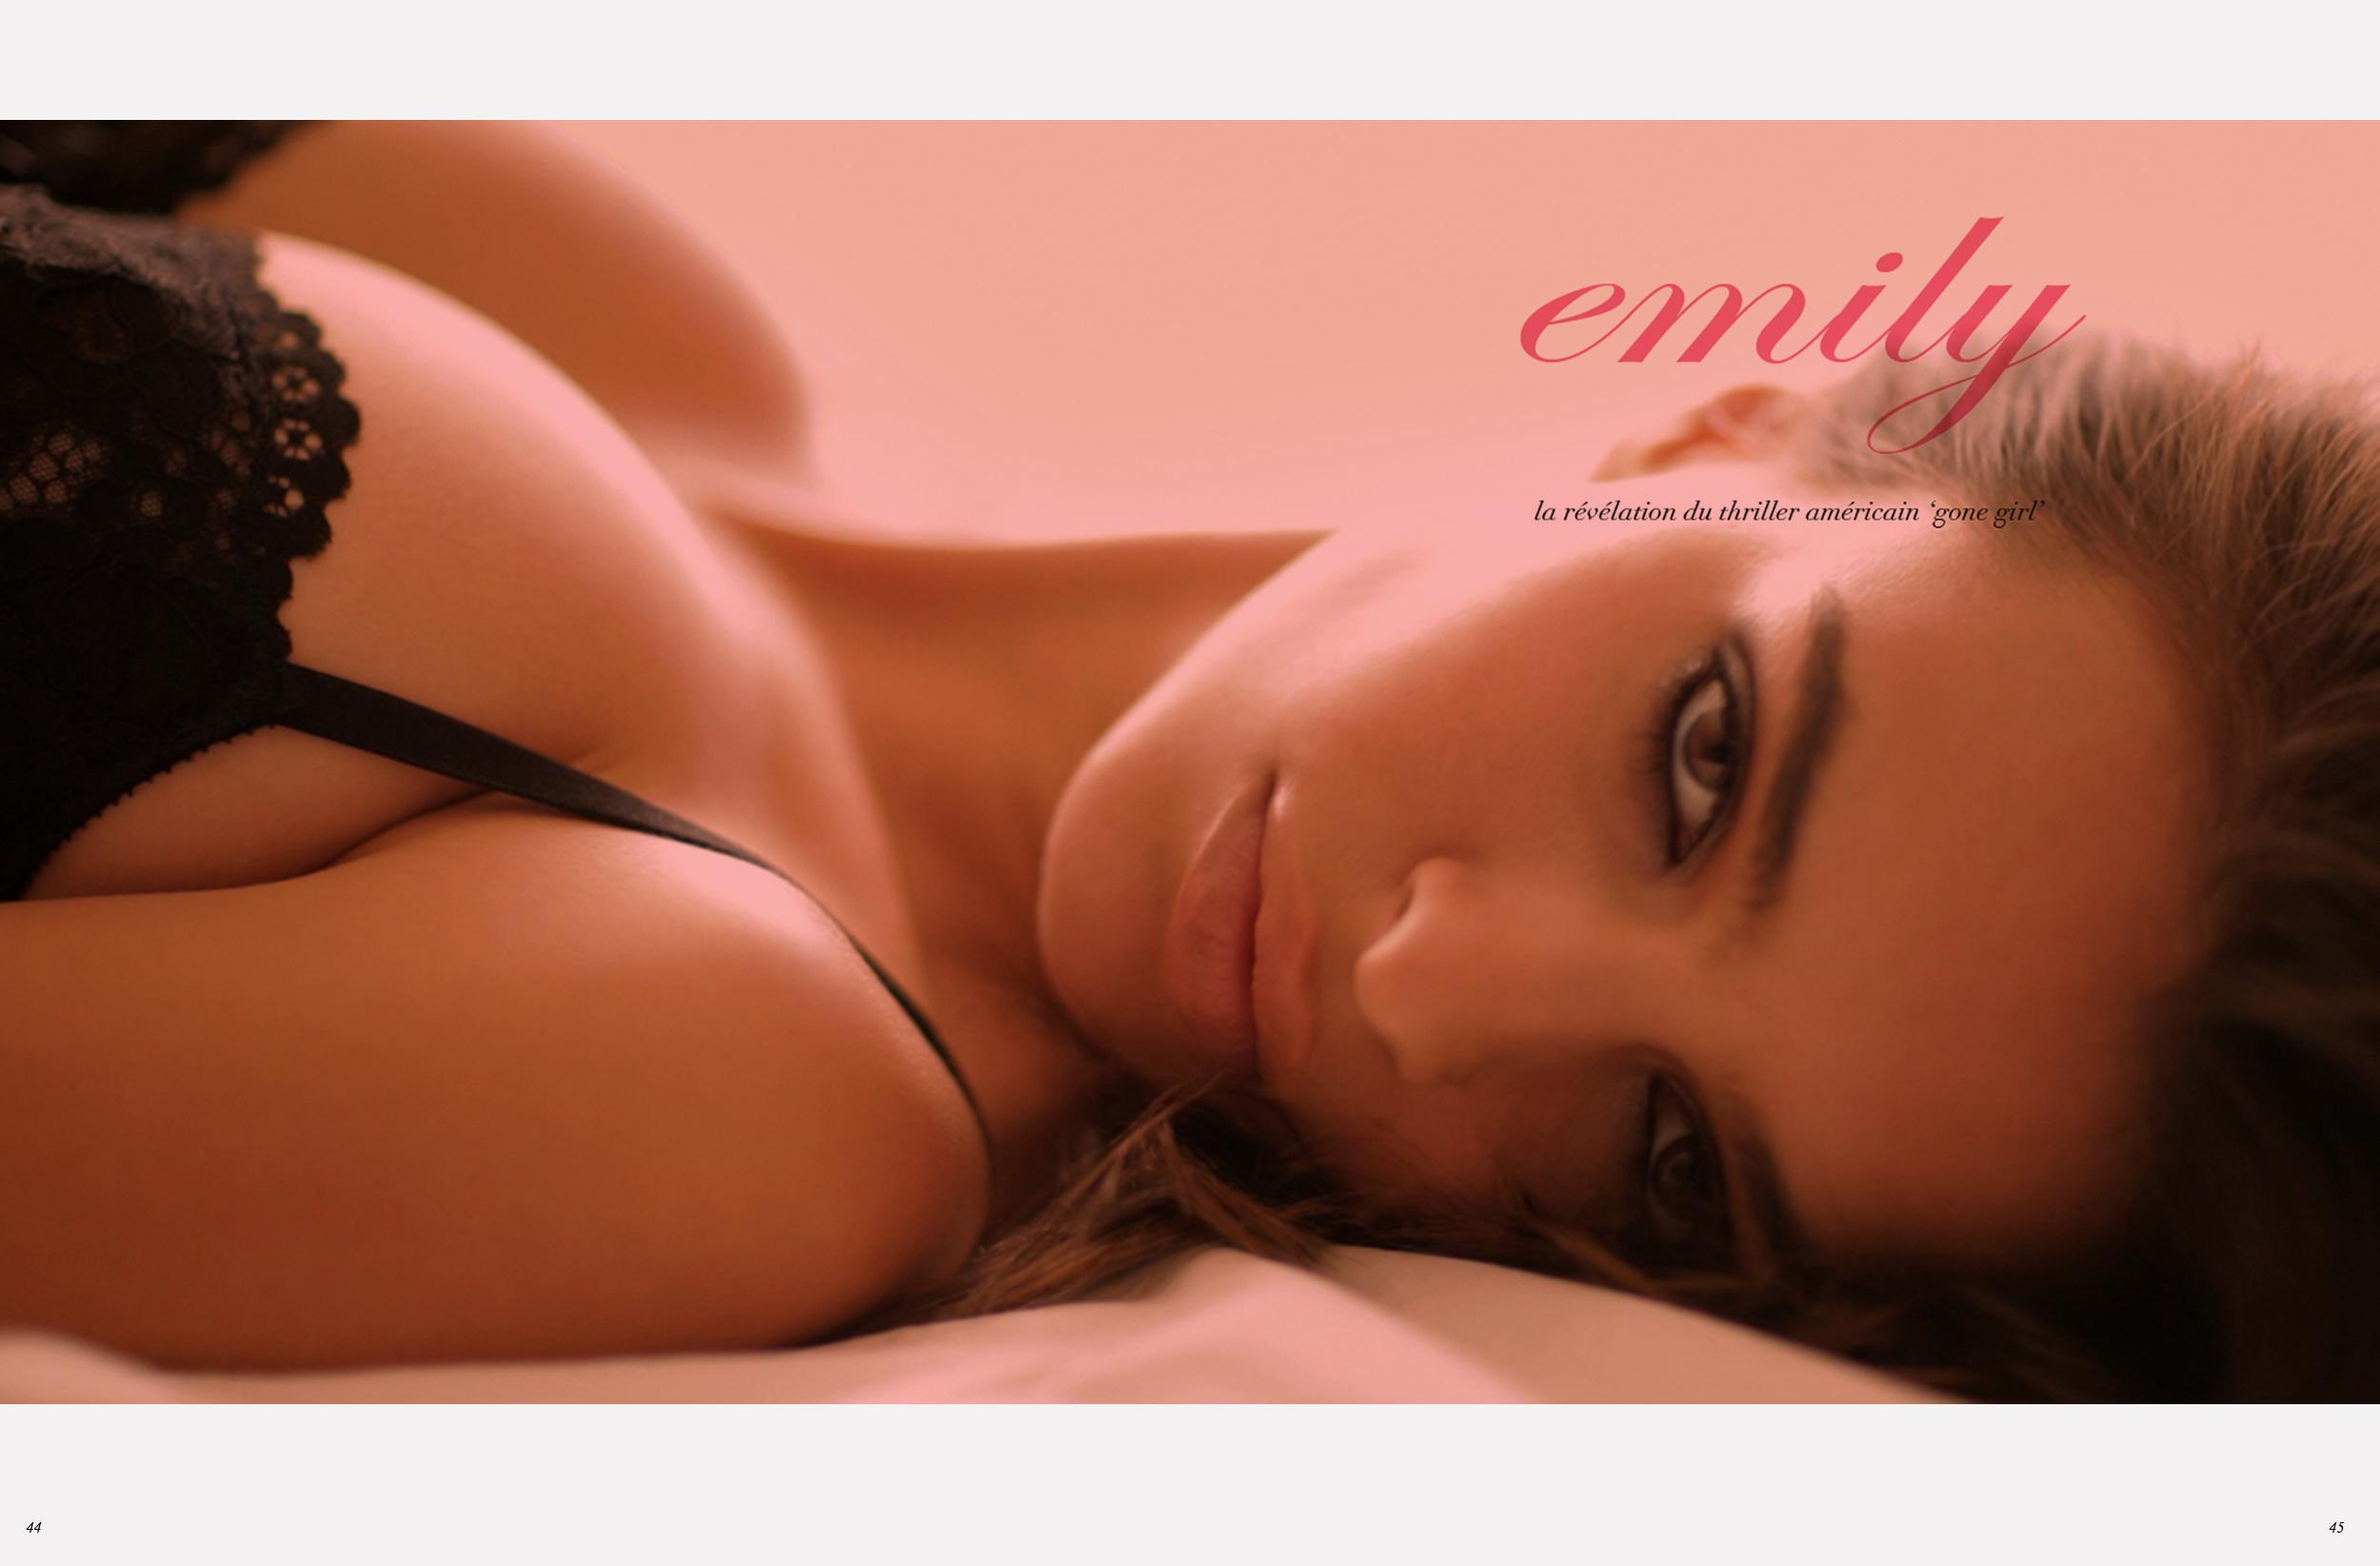 emily_page-p1-2_example.jpg